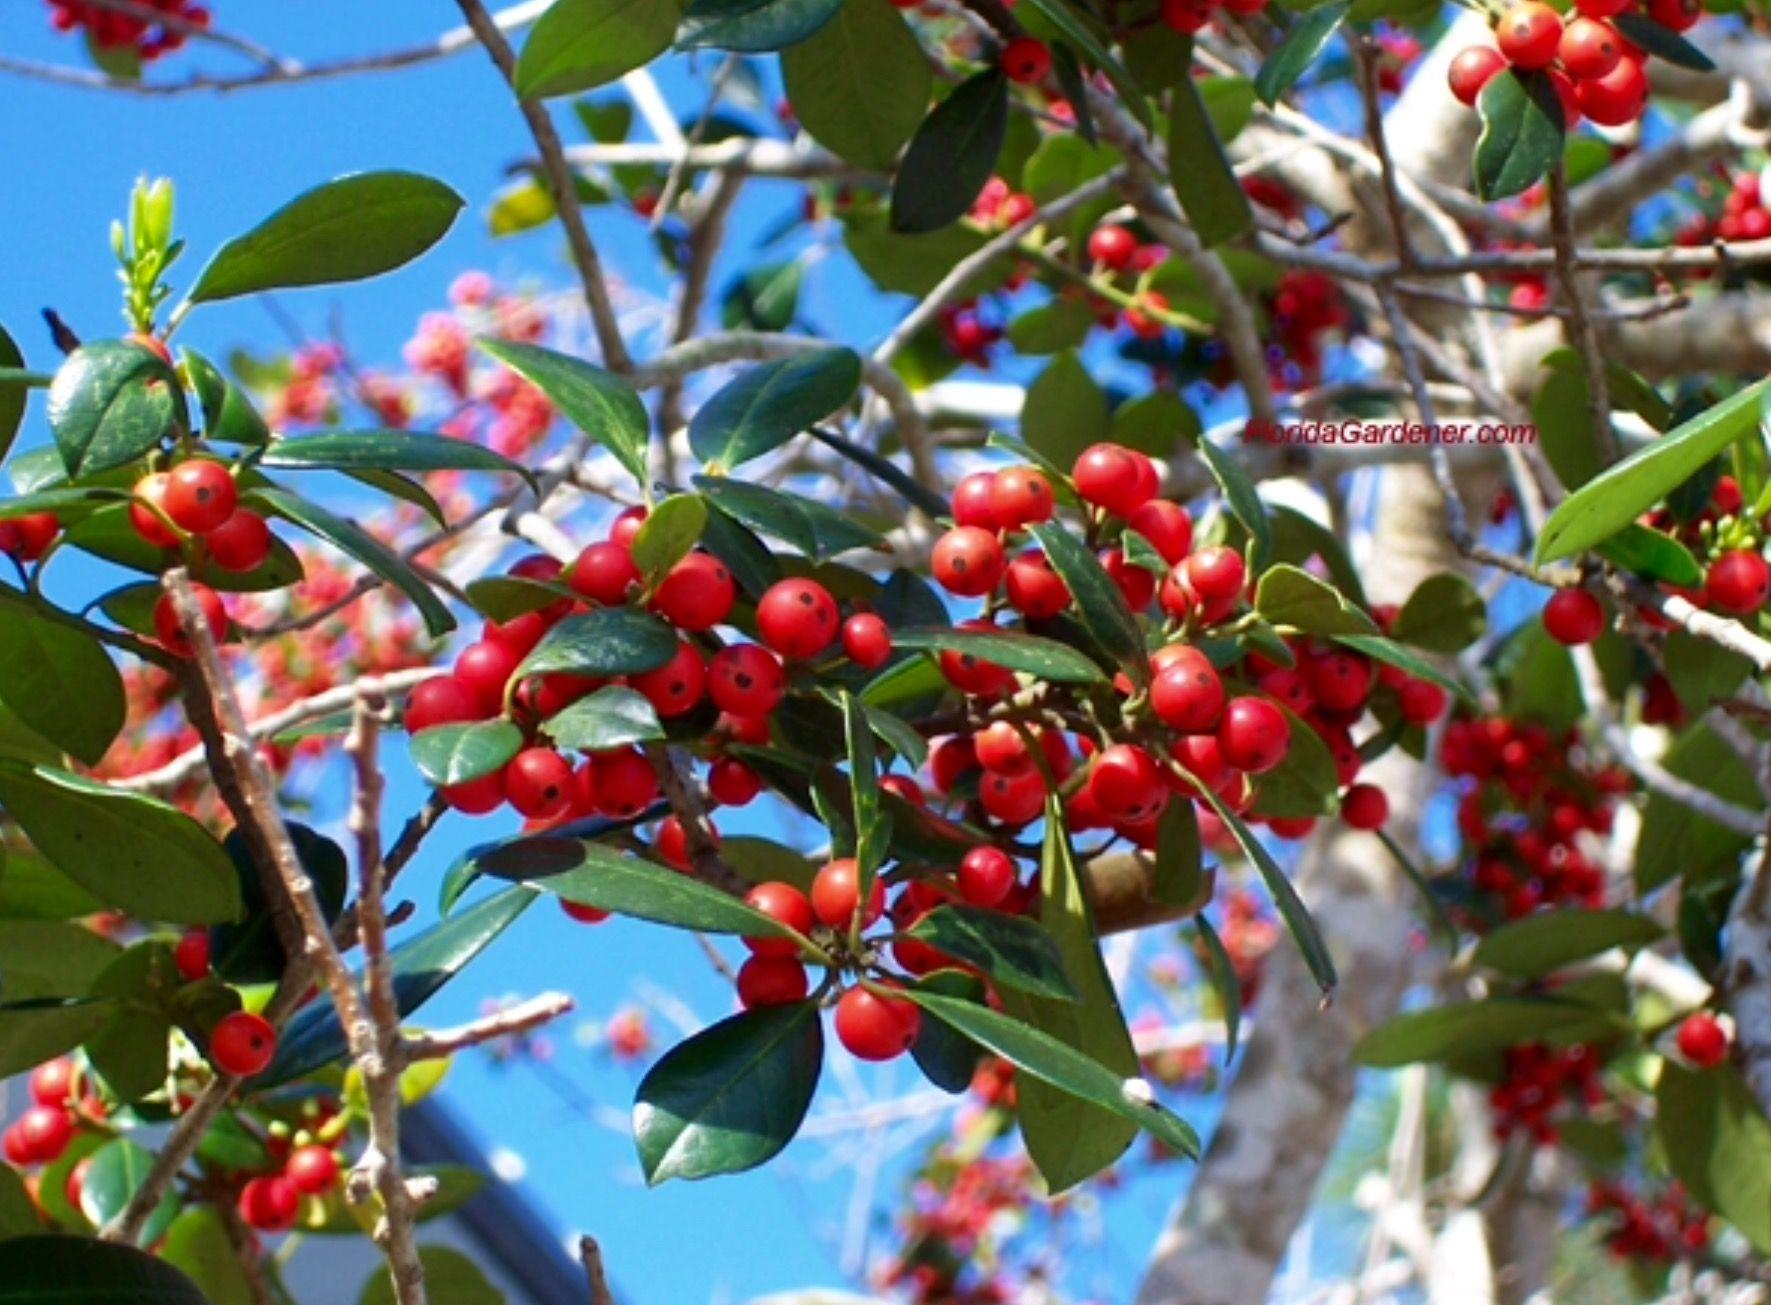 Dahoon Holly Ilex Cassine Understory Tree Wildlife Attractor Holiday Decorations Farmers Market Flowers Small Yellow Flowers Small Ornamental Trees